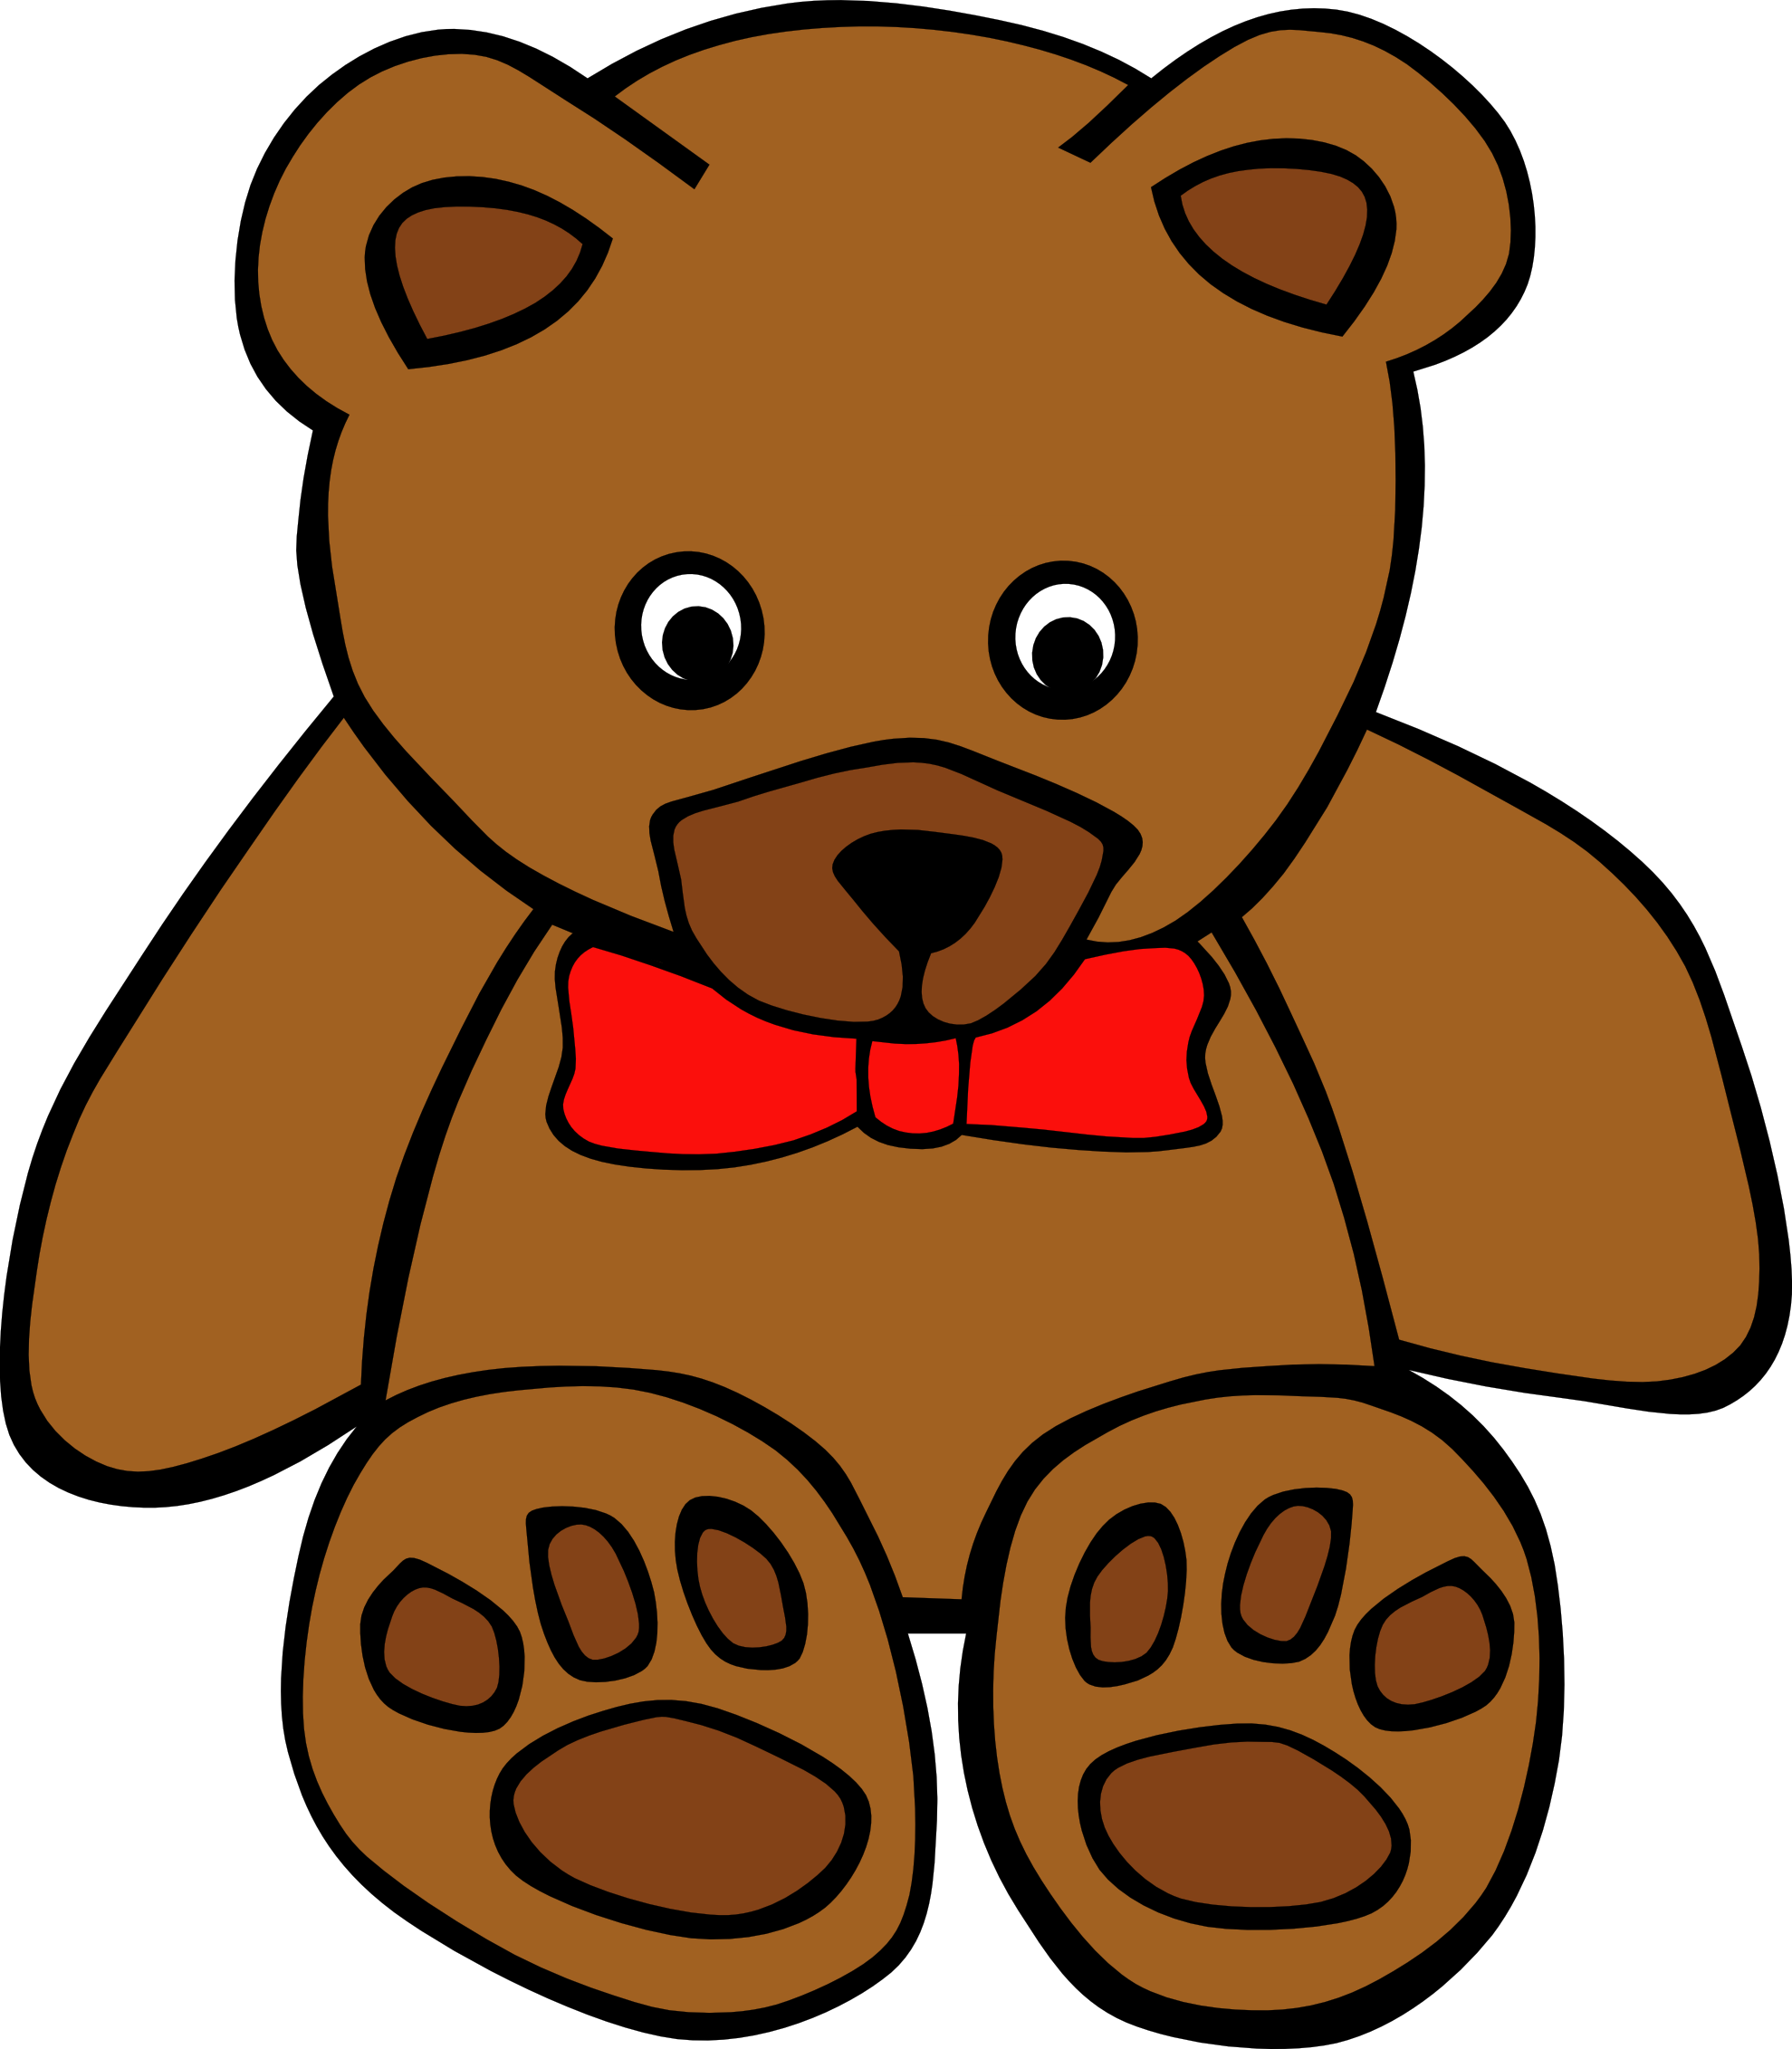 Teddy Bear Clipart Free Clipart Images 4-Teddy bear clipart free clipart images 4-14